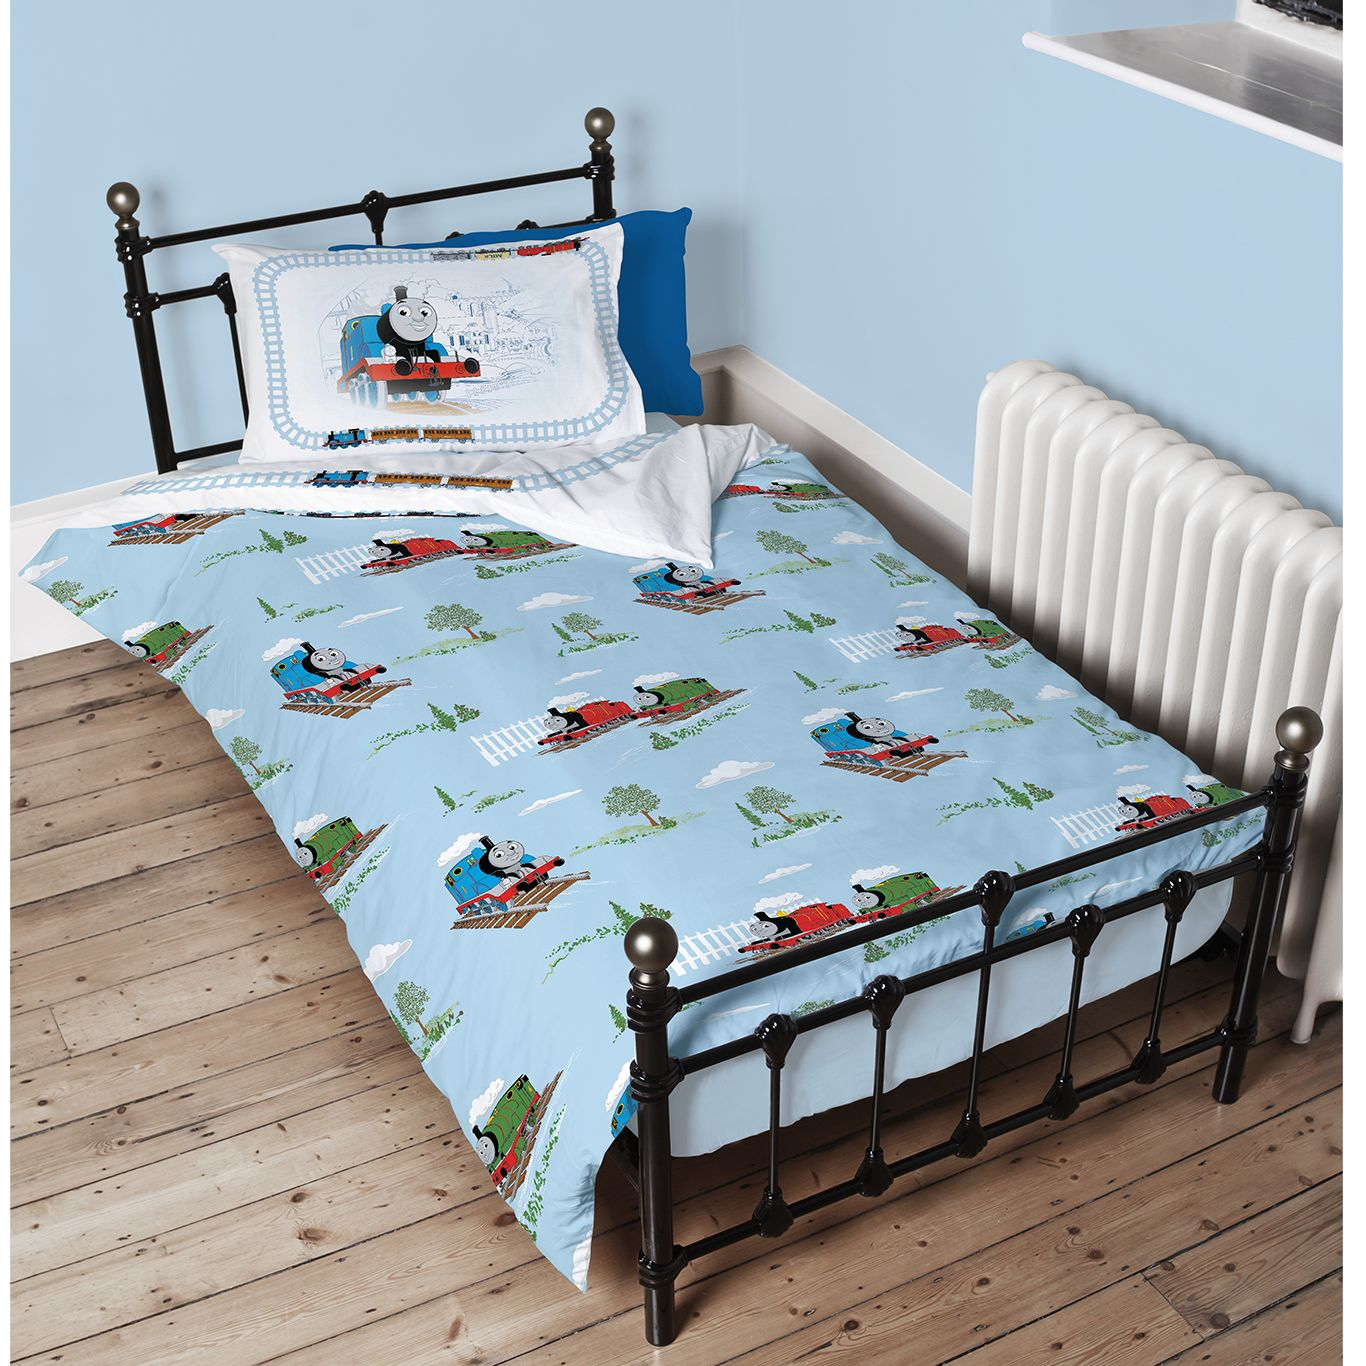 Thomas & Friends Cotton Duvet Cover and Pillowcase Set, Single